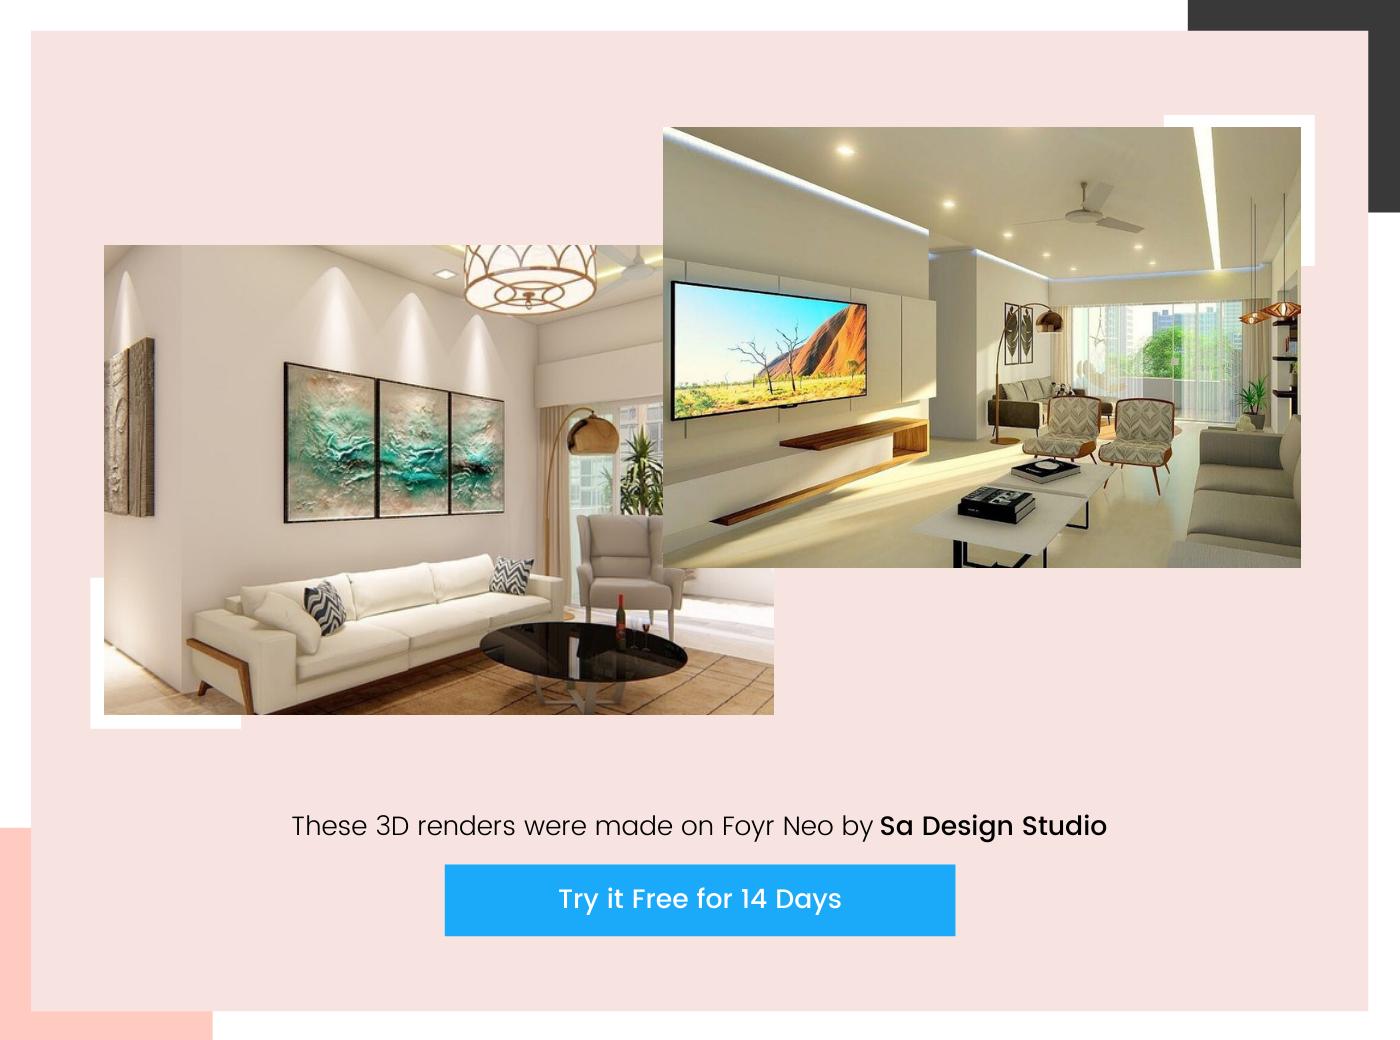 home design render by Sa Design Studio